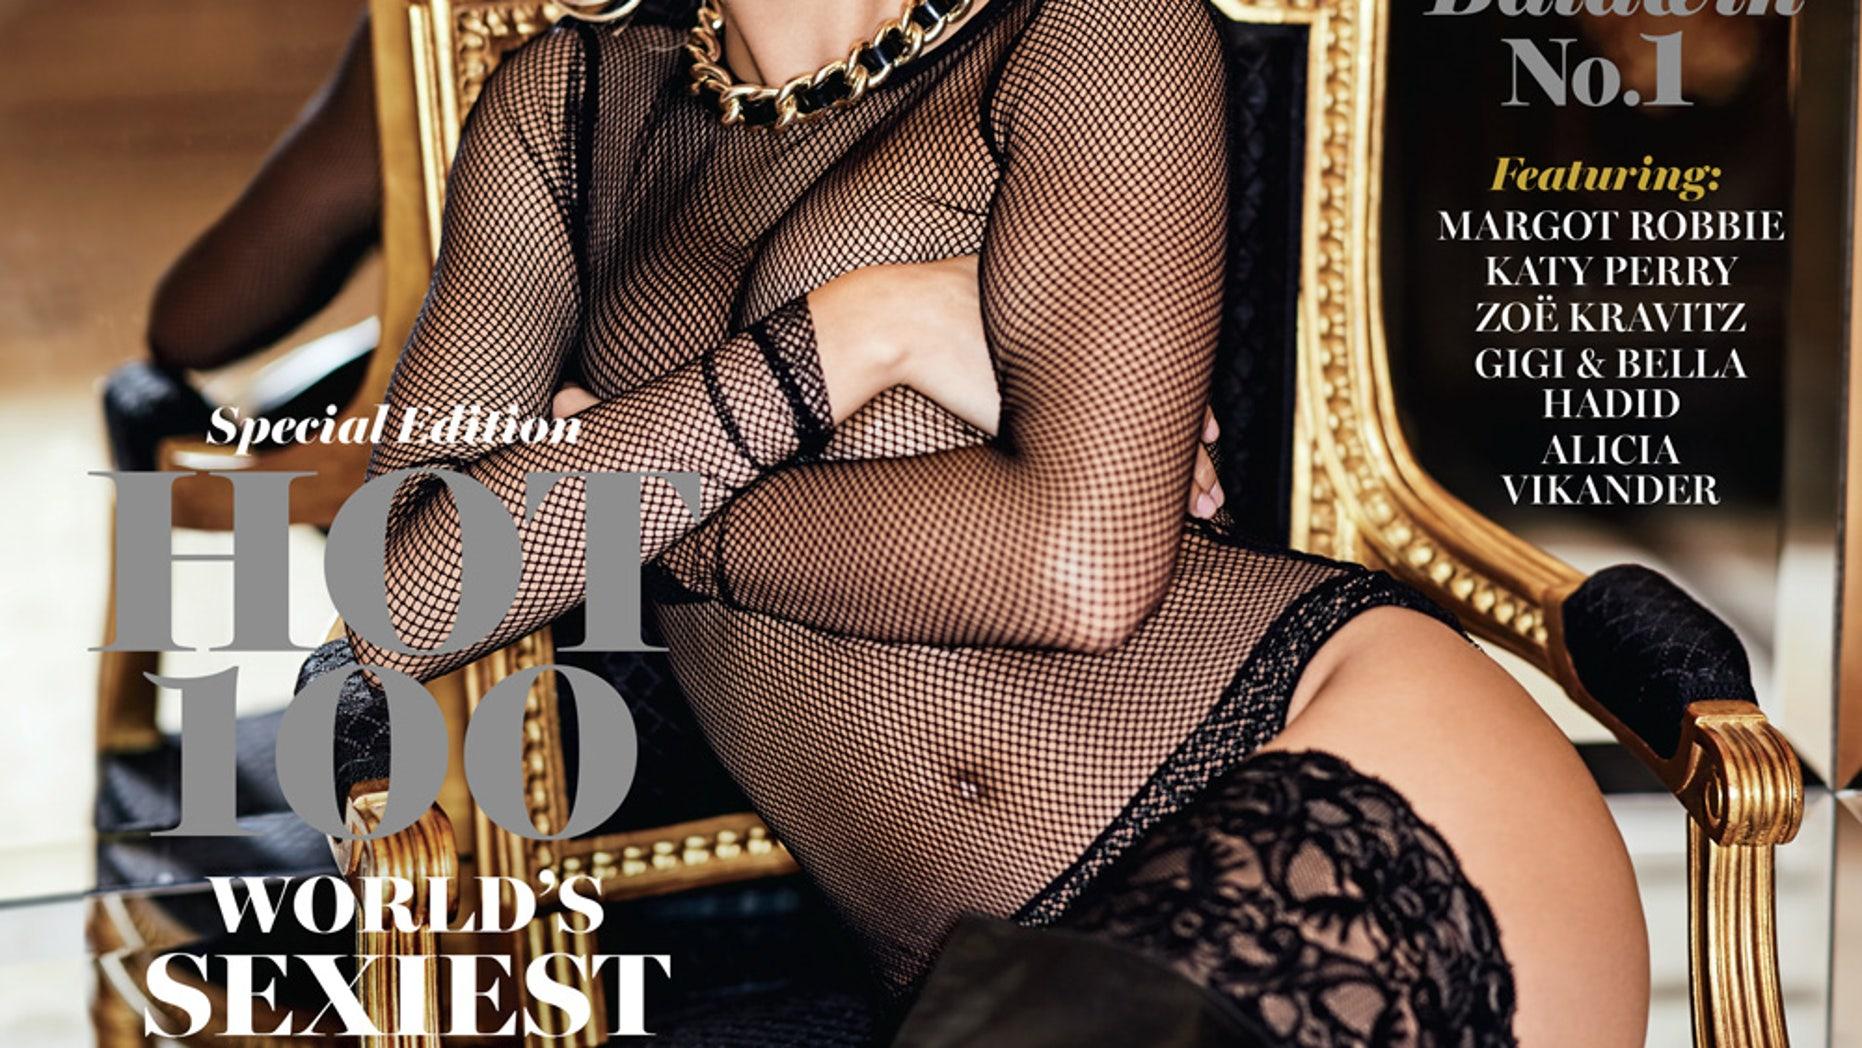 Hailey Baldwin was named World's Sexiest Woman by Maxim Magazine